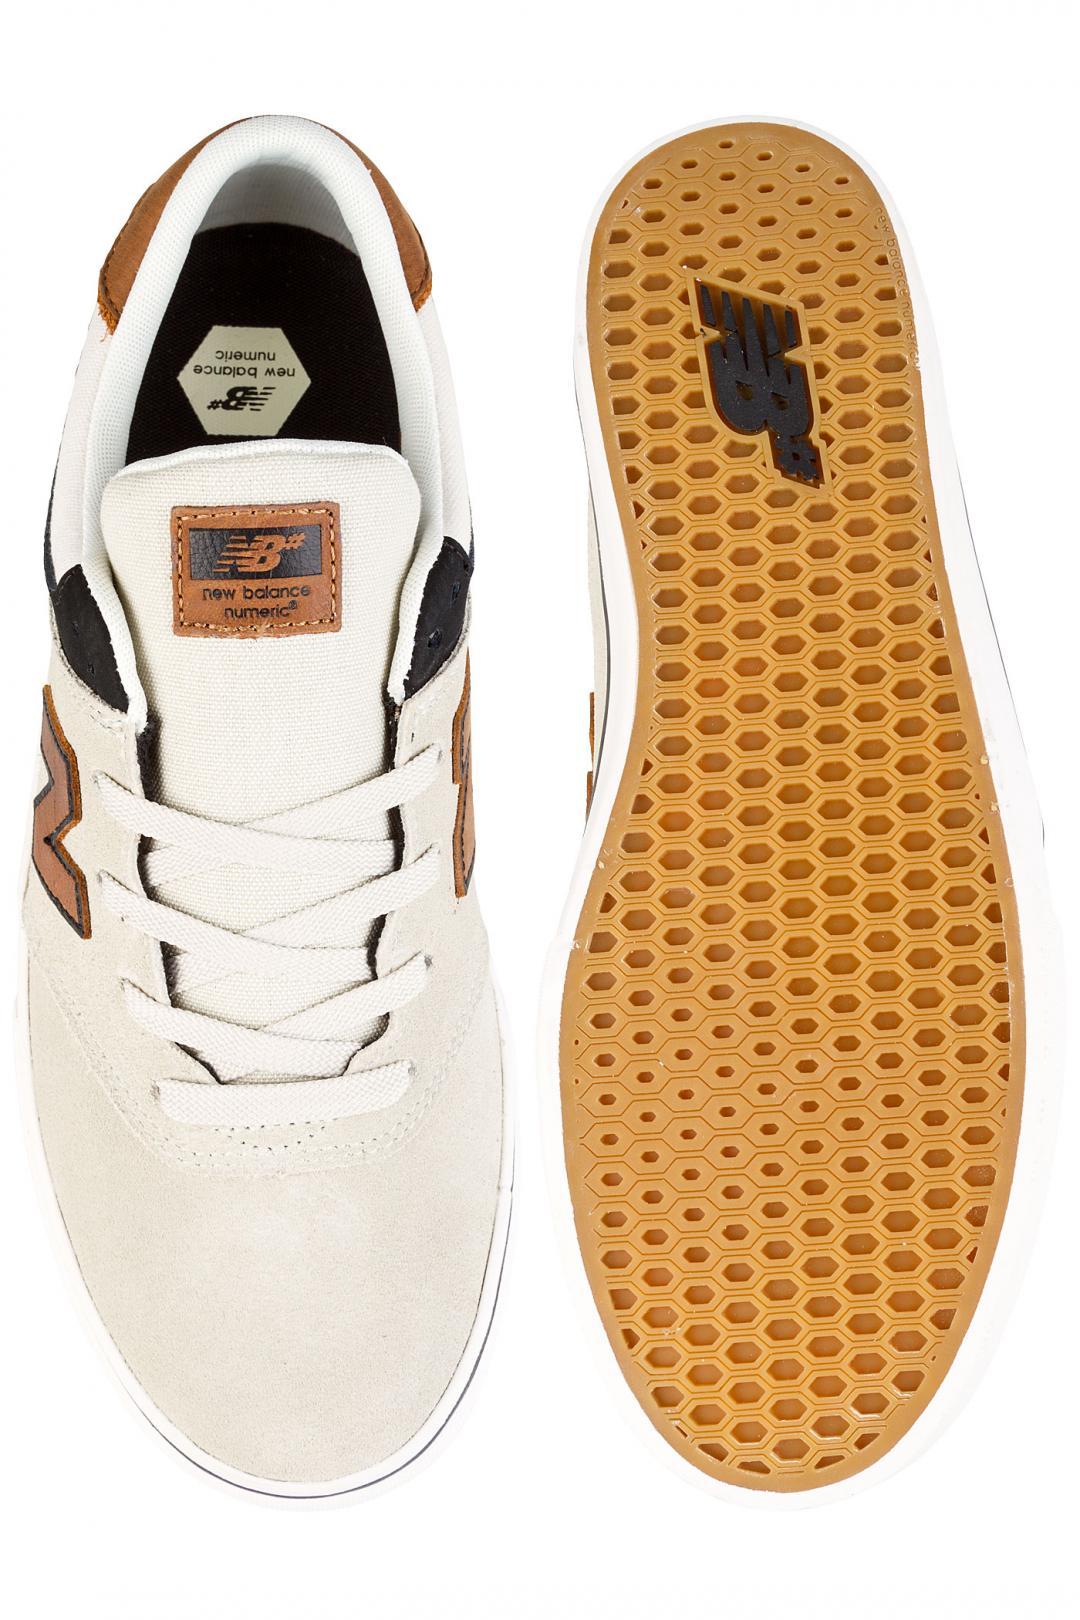 Uomo New Balance Numeric 254 stone black tan   Sneakers low top